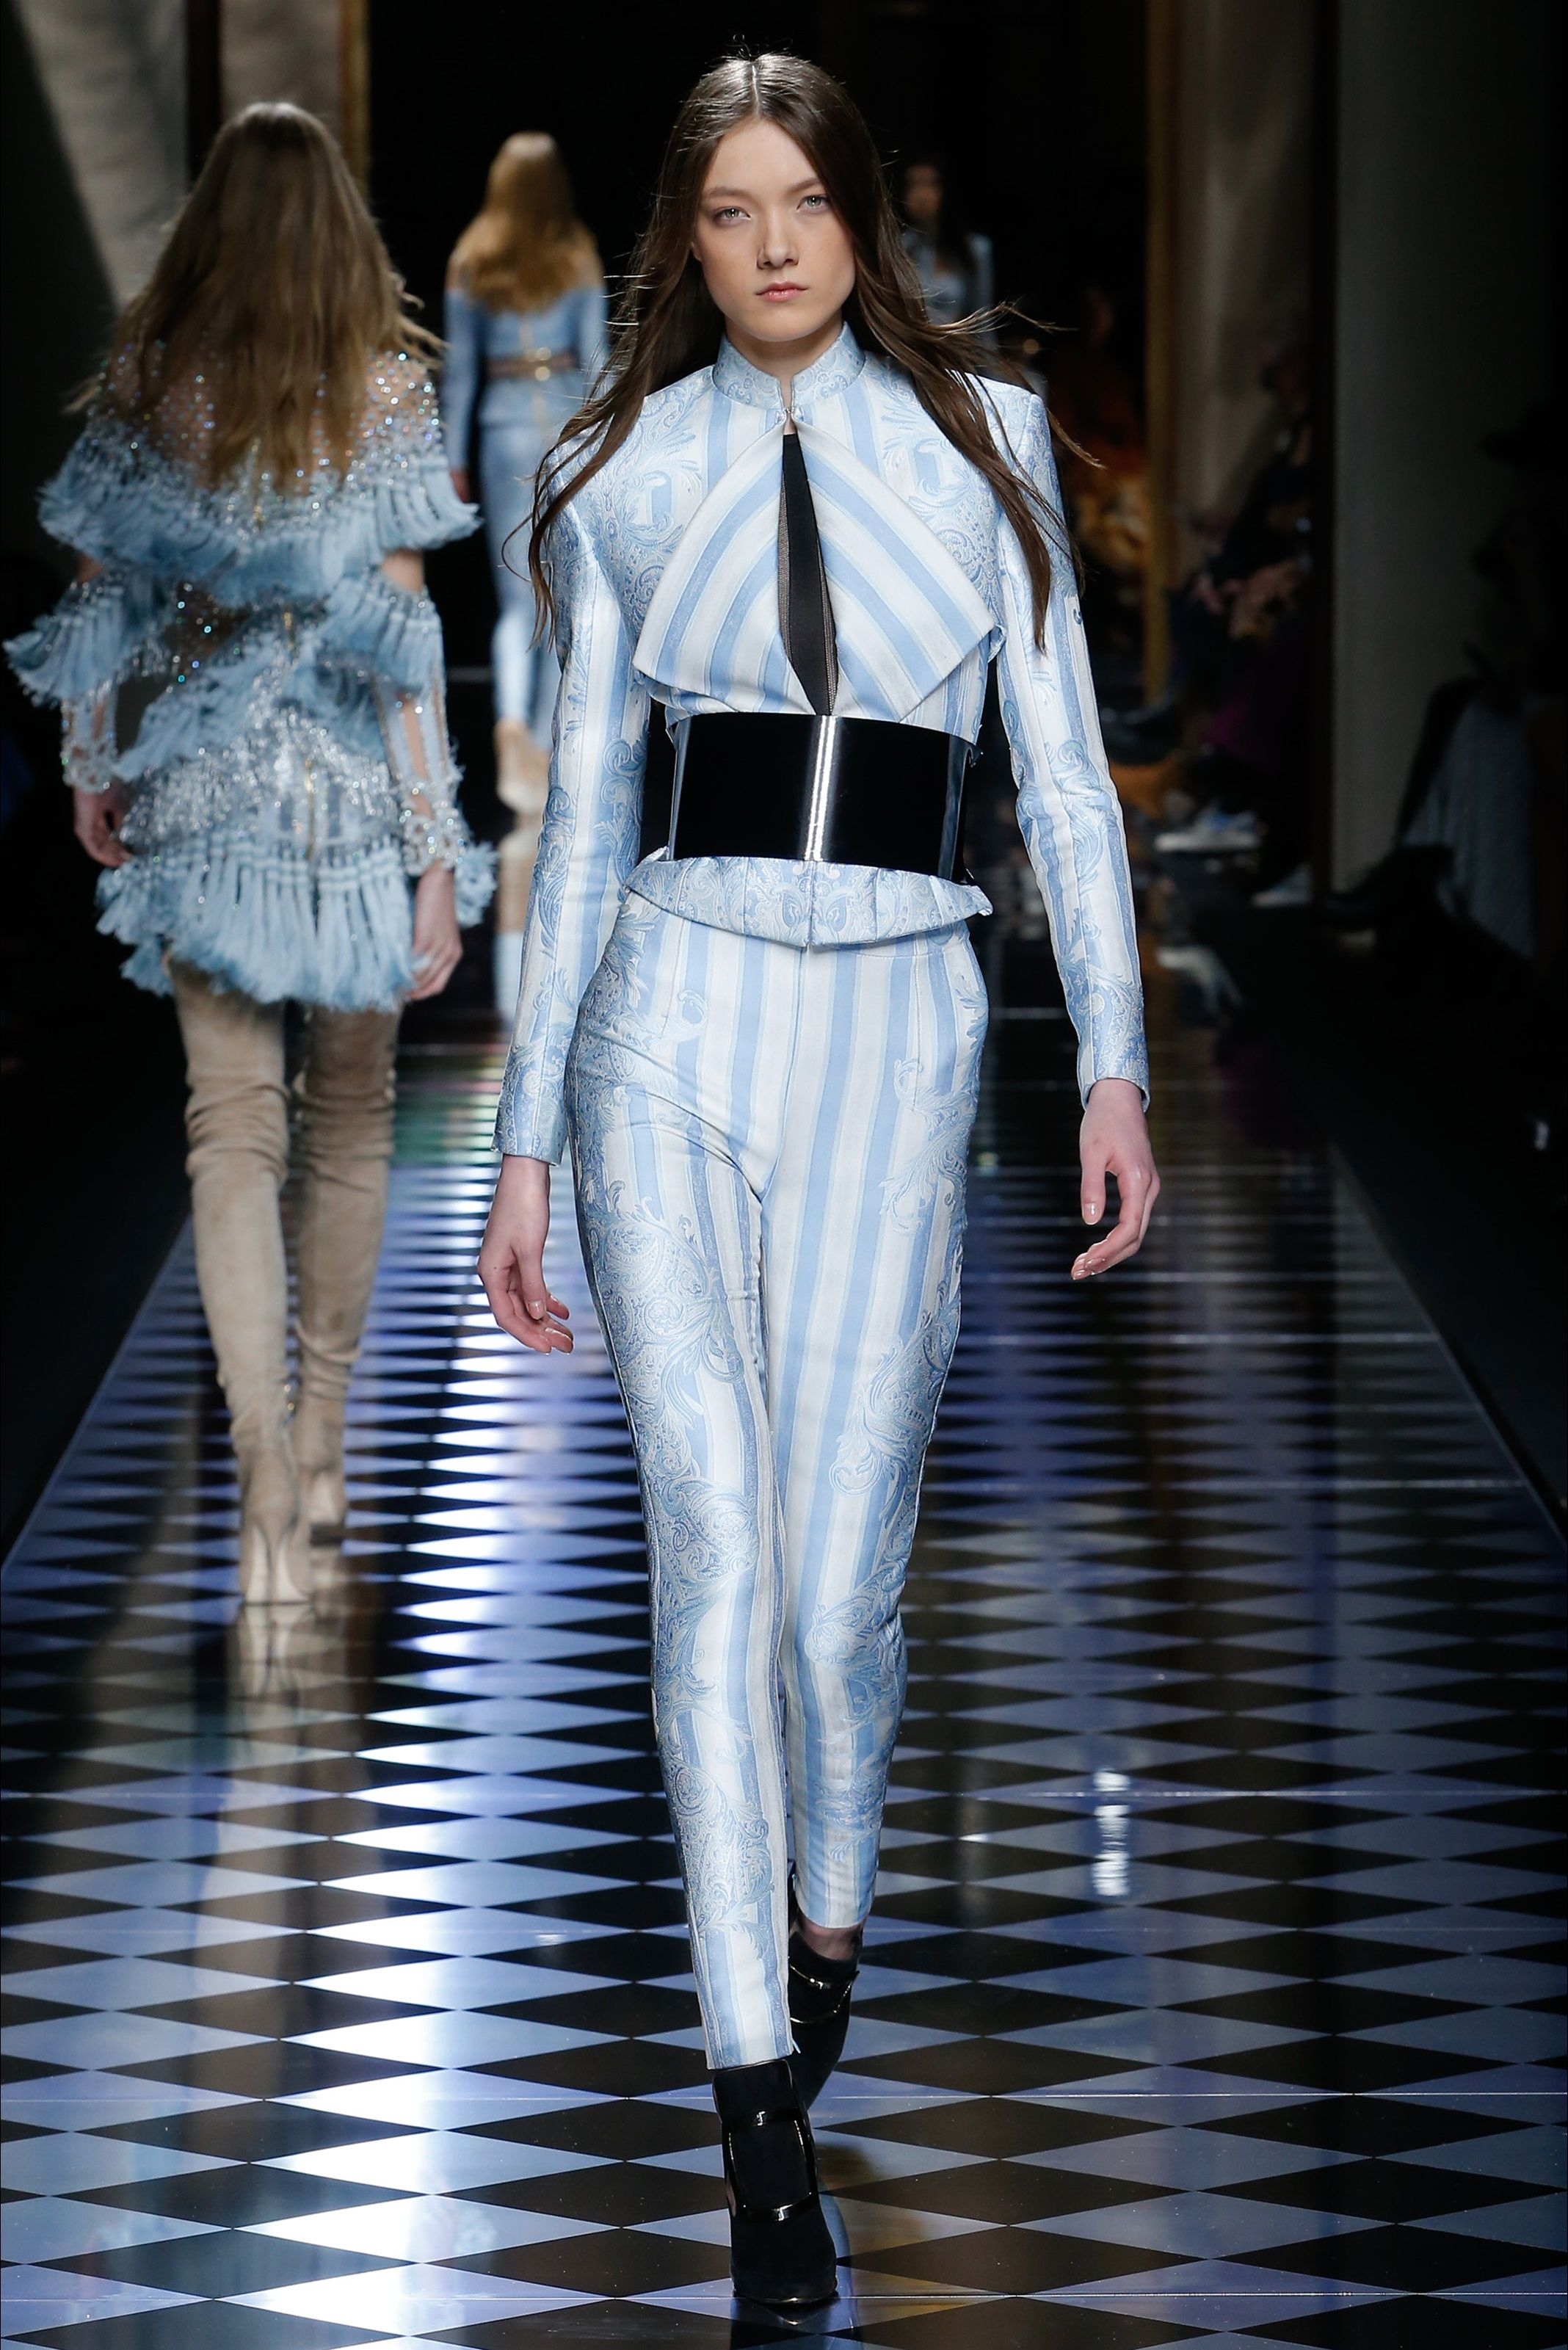 Balmain Parigi - Collections Fall Winter 2016-17 - Shows - Vogue.it